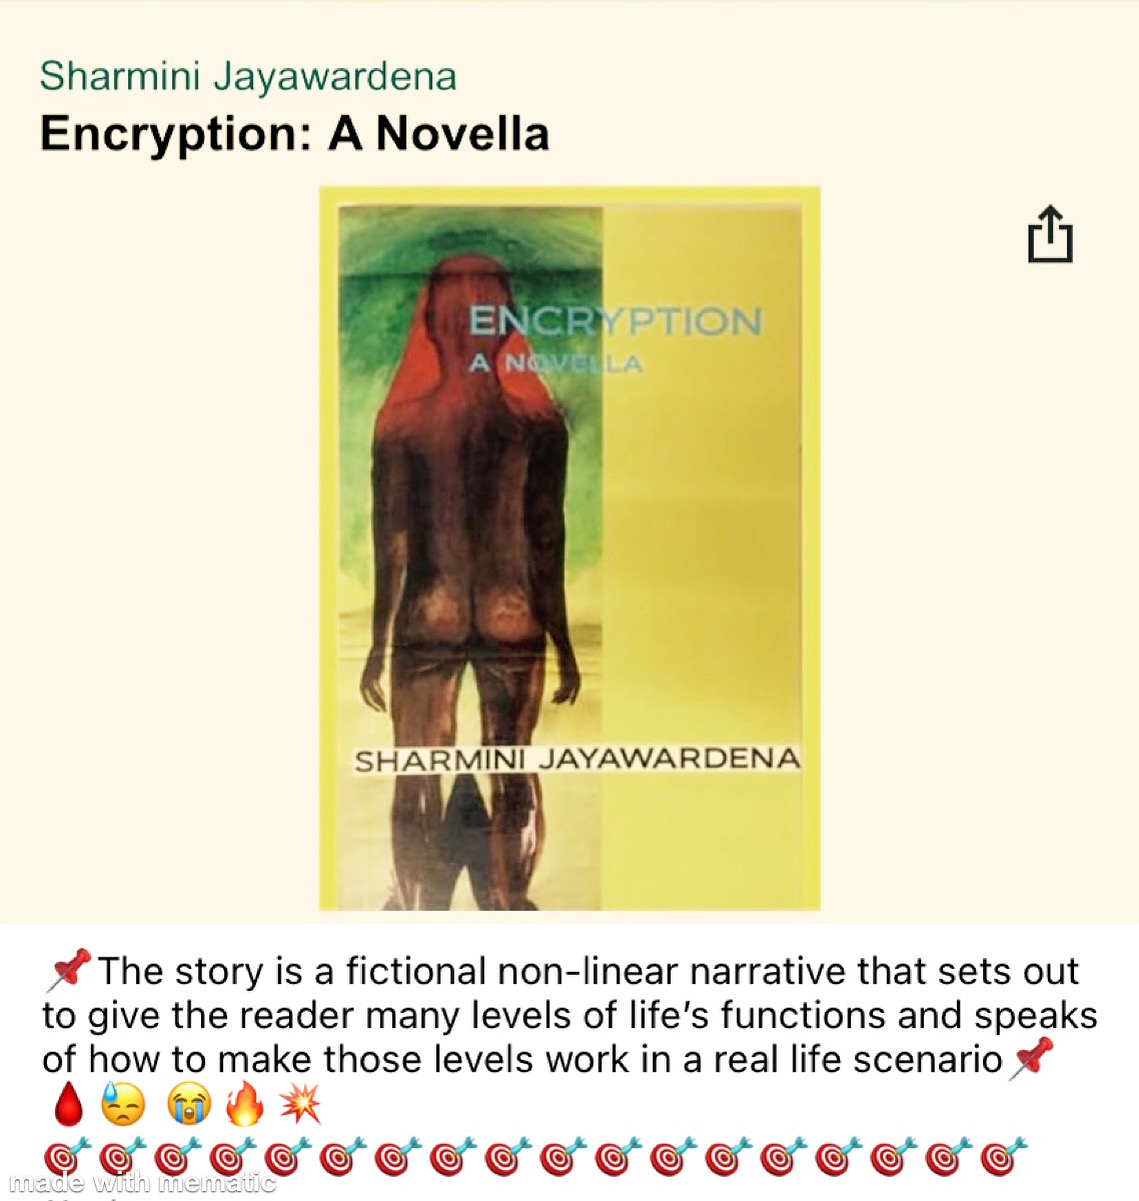 BUY MY BOOK ON AMAZON.COM - ENCRYPTION: A NOVELLA BY SHARMINI JAYAWARDENA